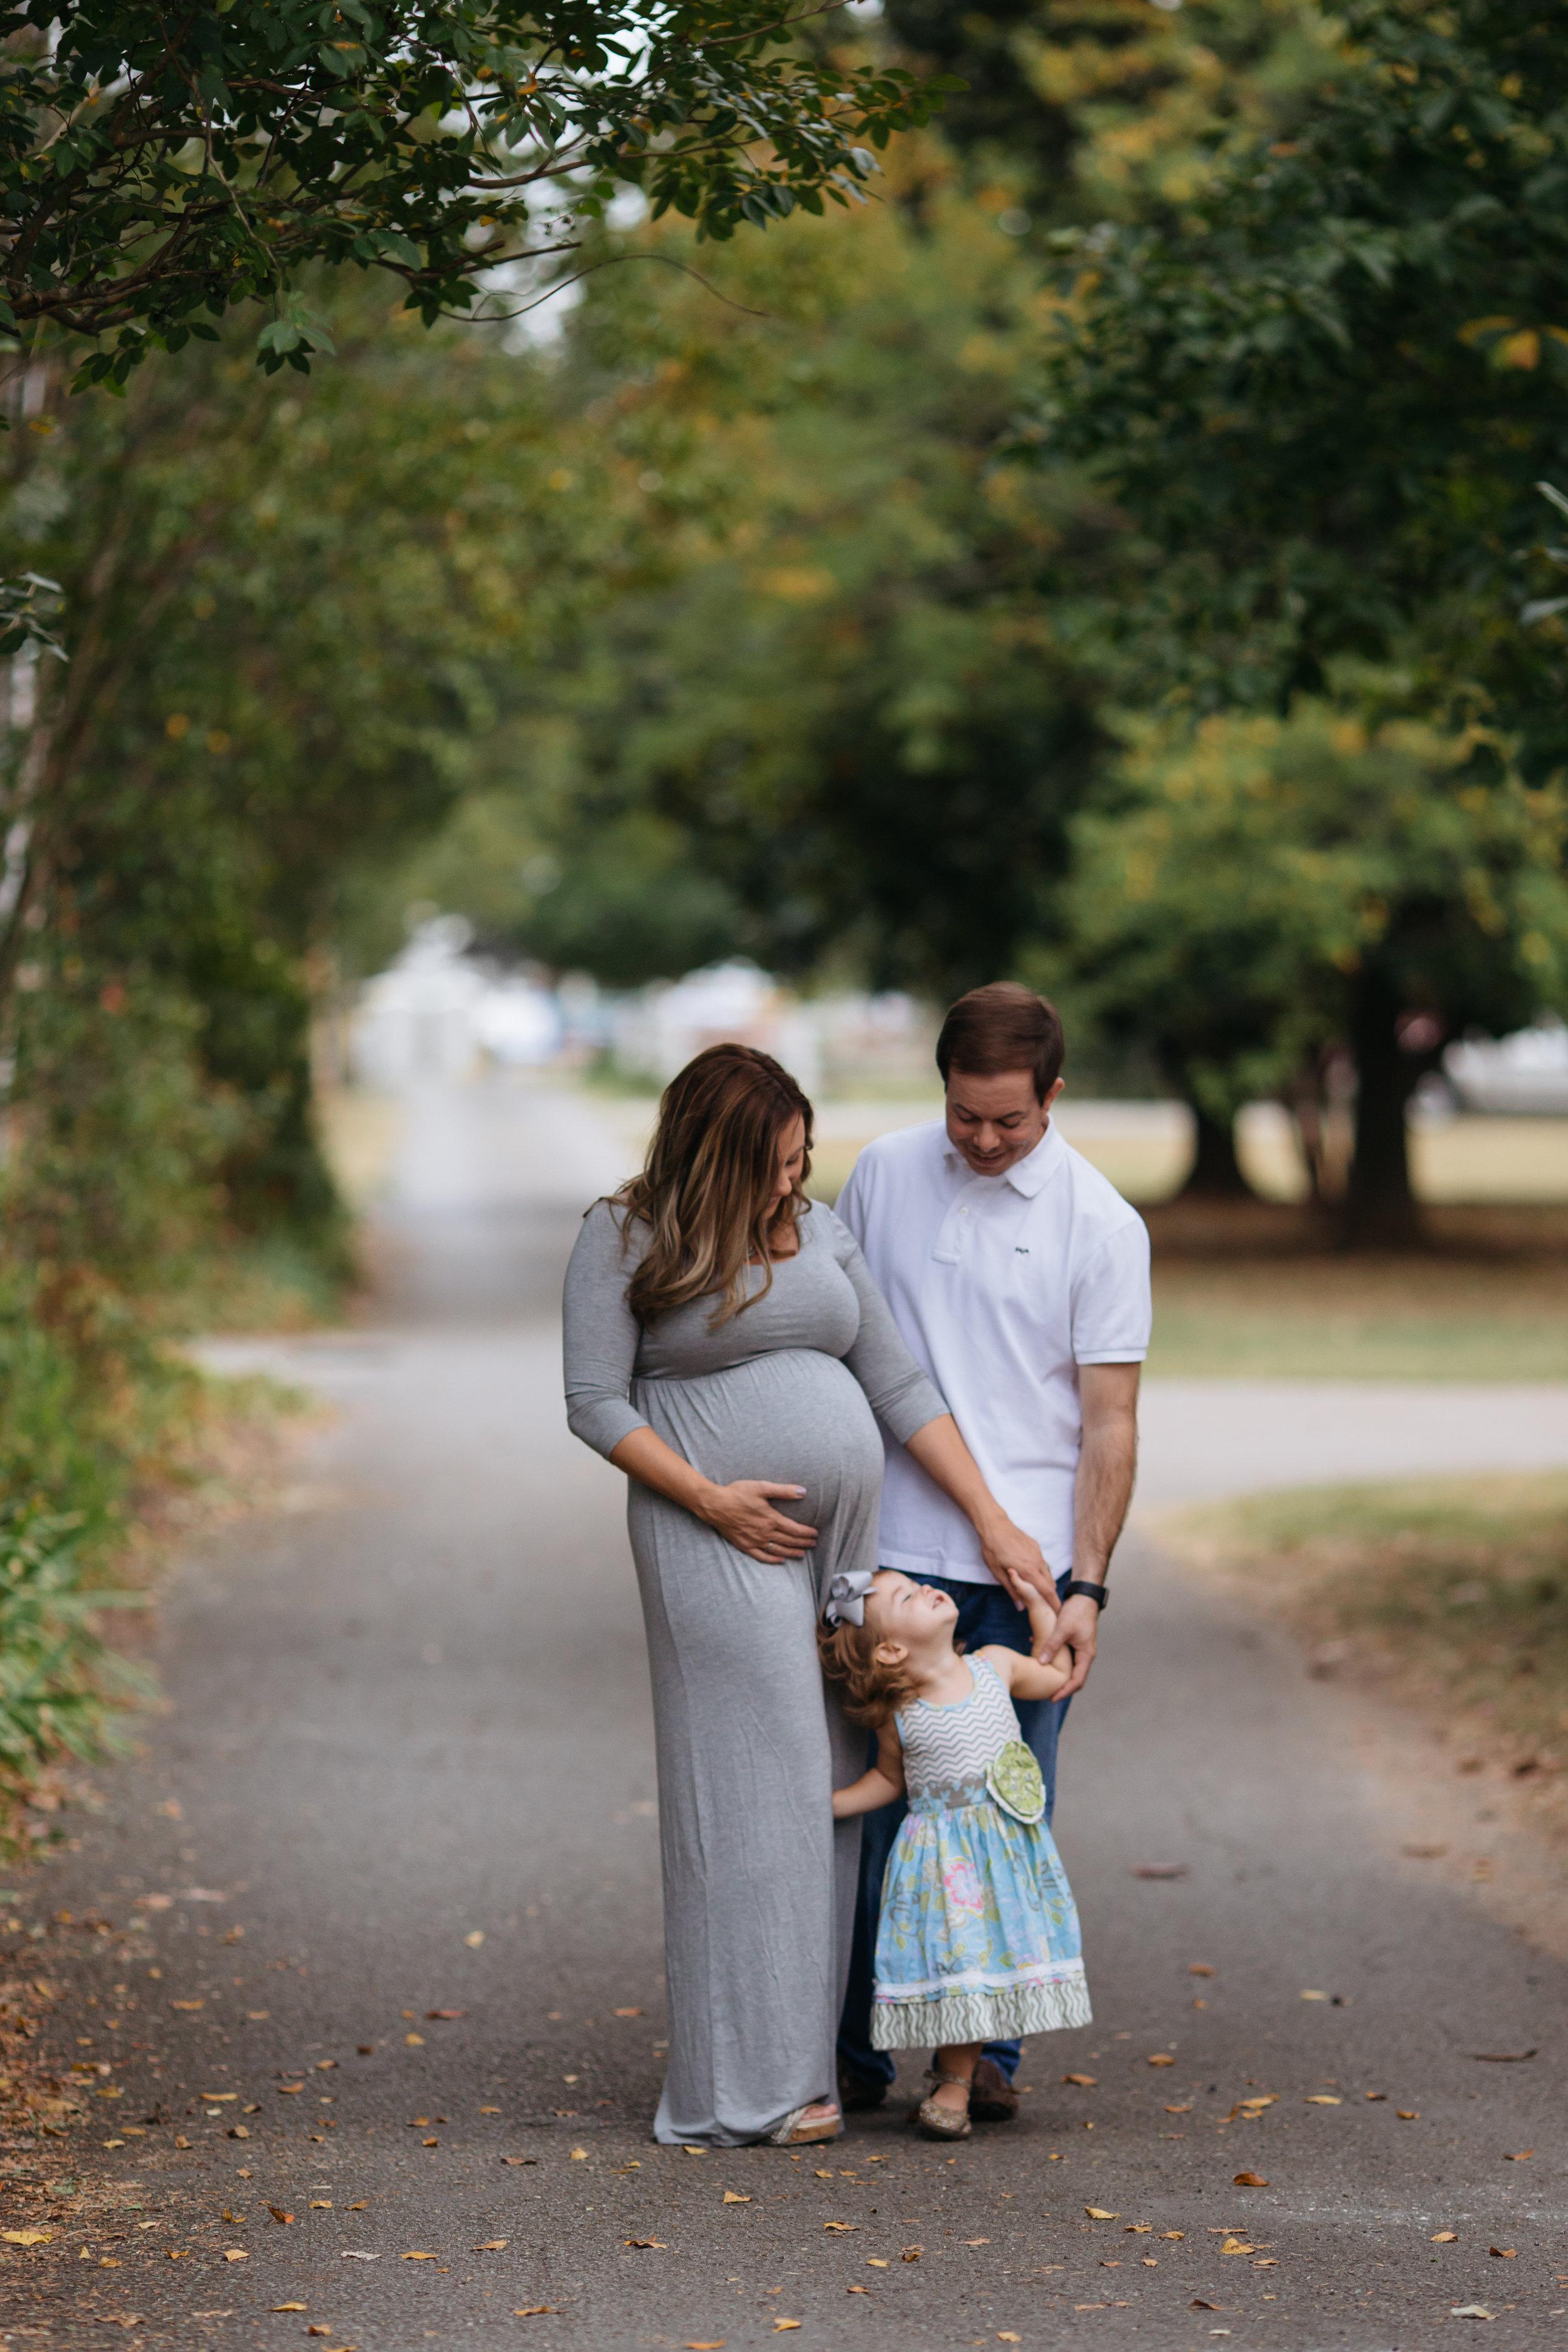 mary-colleen-photography-madison-alabama-family-newborn-lifestyle-photographer0040.jpg